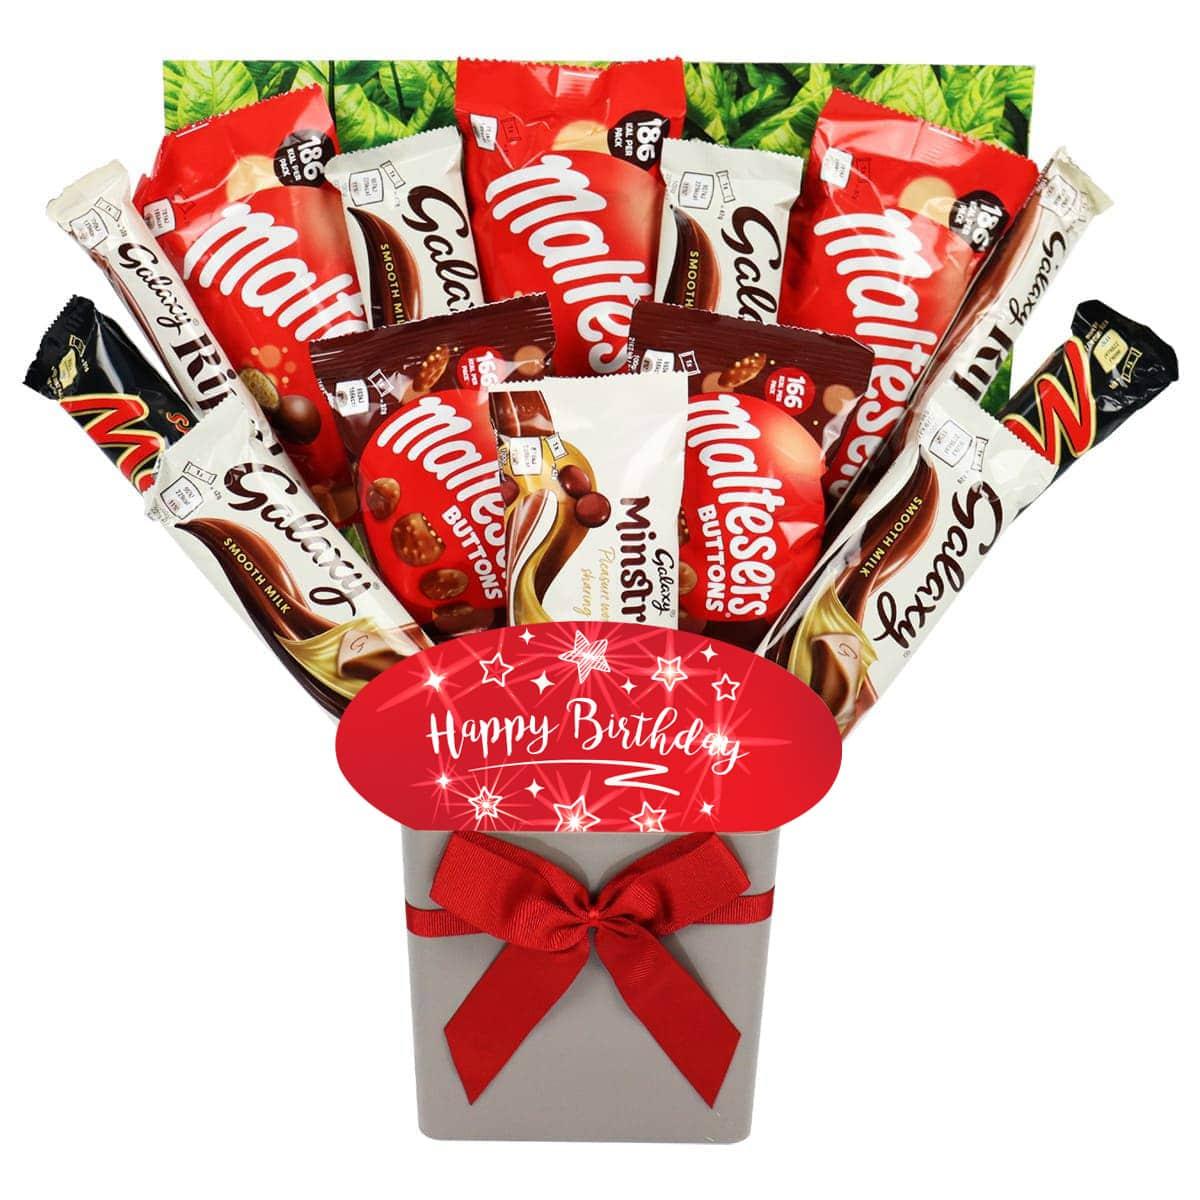 The Happy Birthday Galaxy Chocolate Bouquet